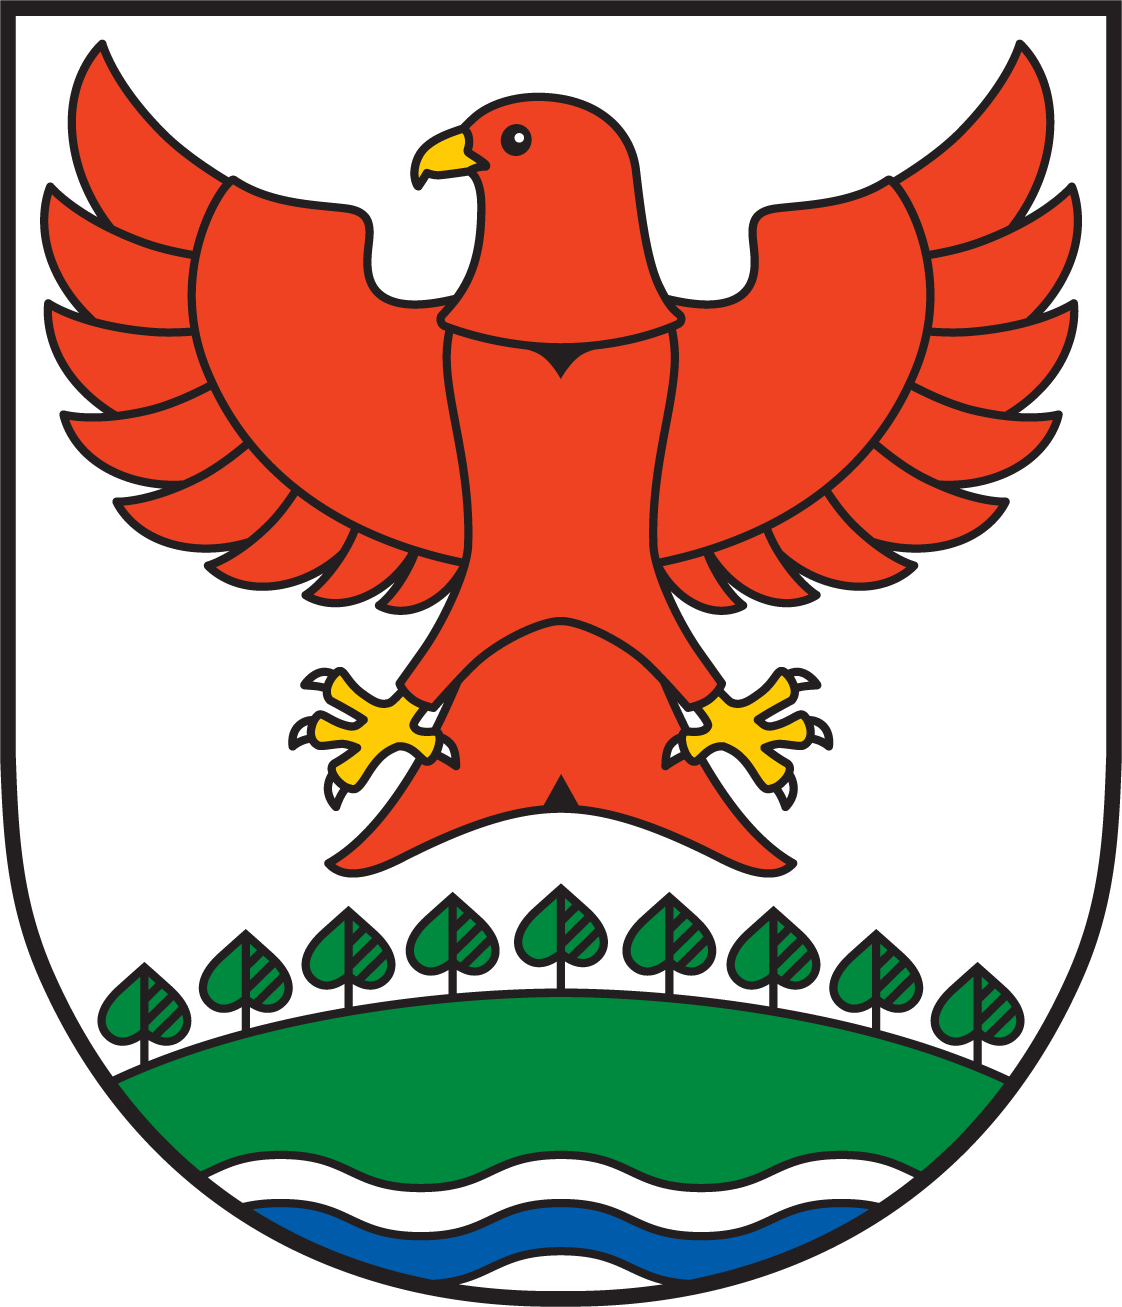 Wappen Ilmtal-Weinstraße